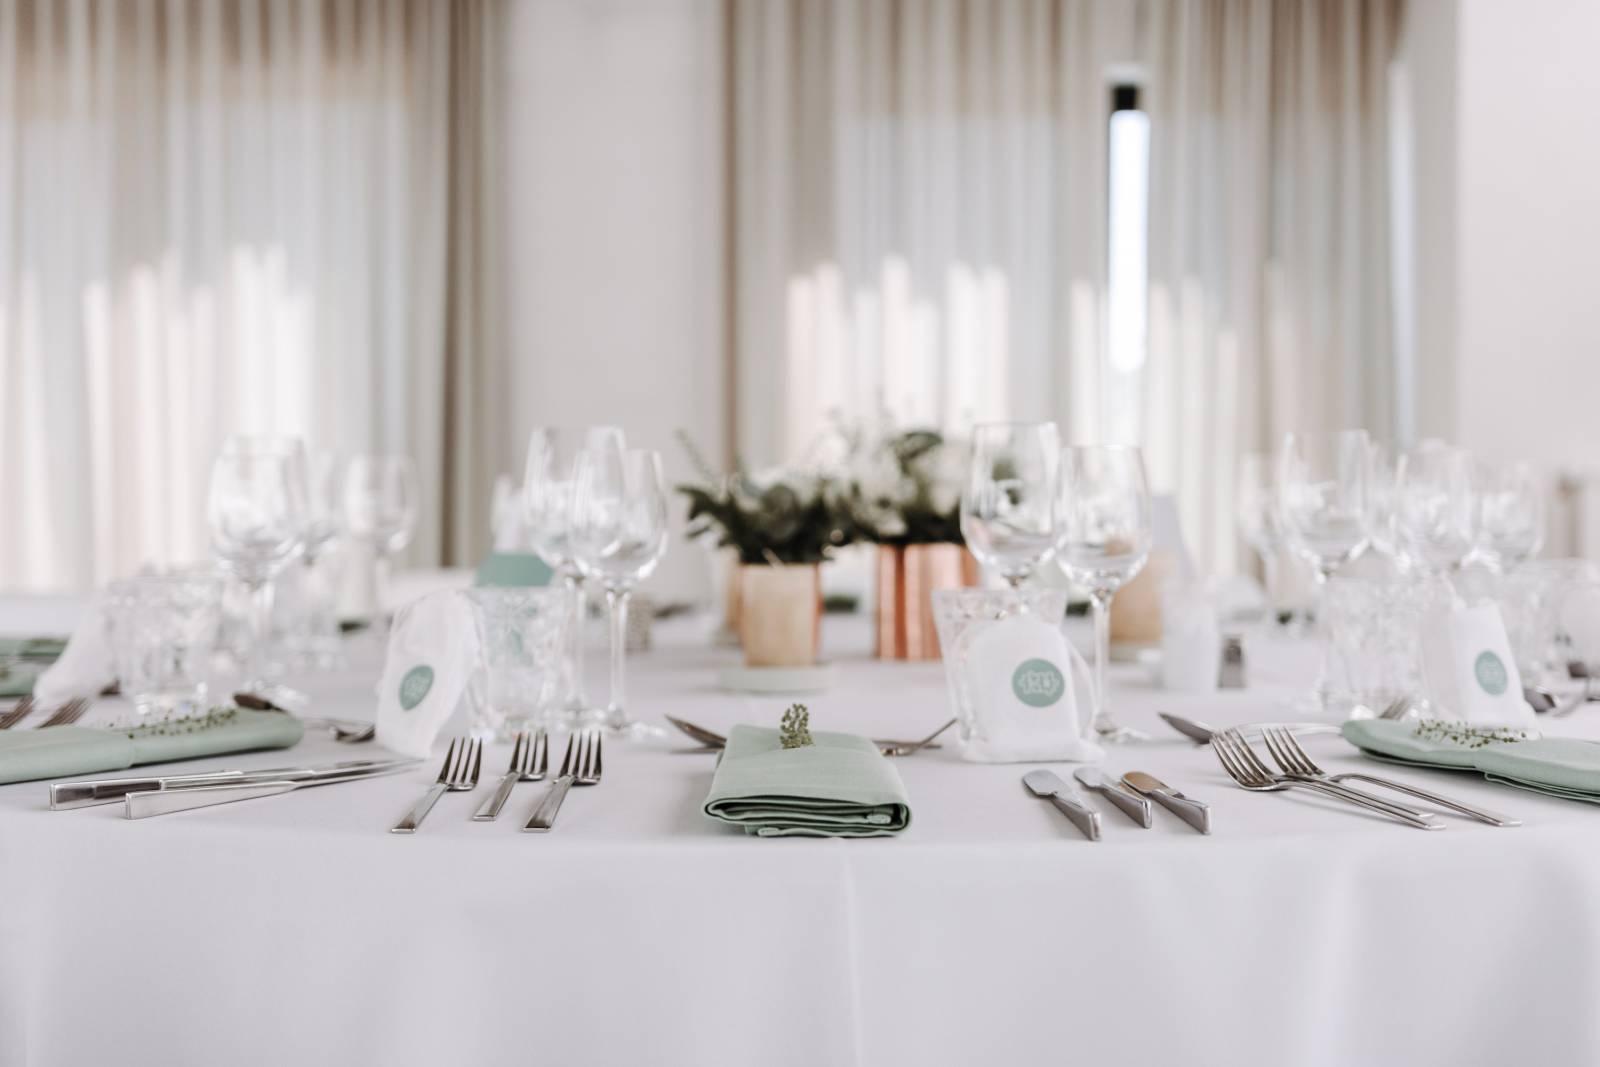 Atelier Rosé - Wedding Planner - House of Weddings Sara & Reinout - Djorden Vlaeminck (3)